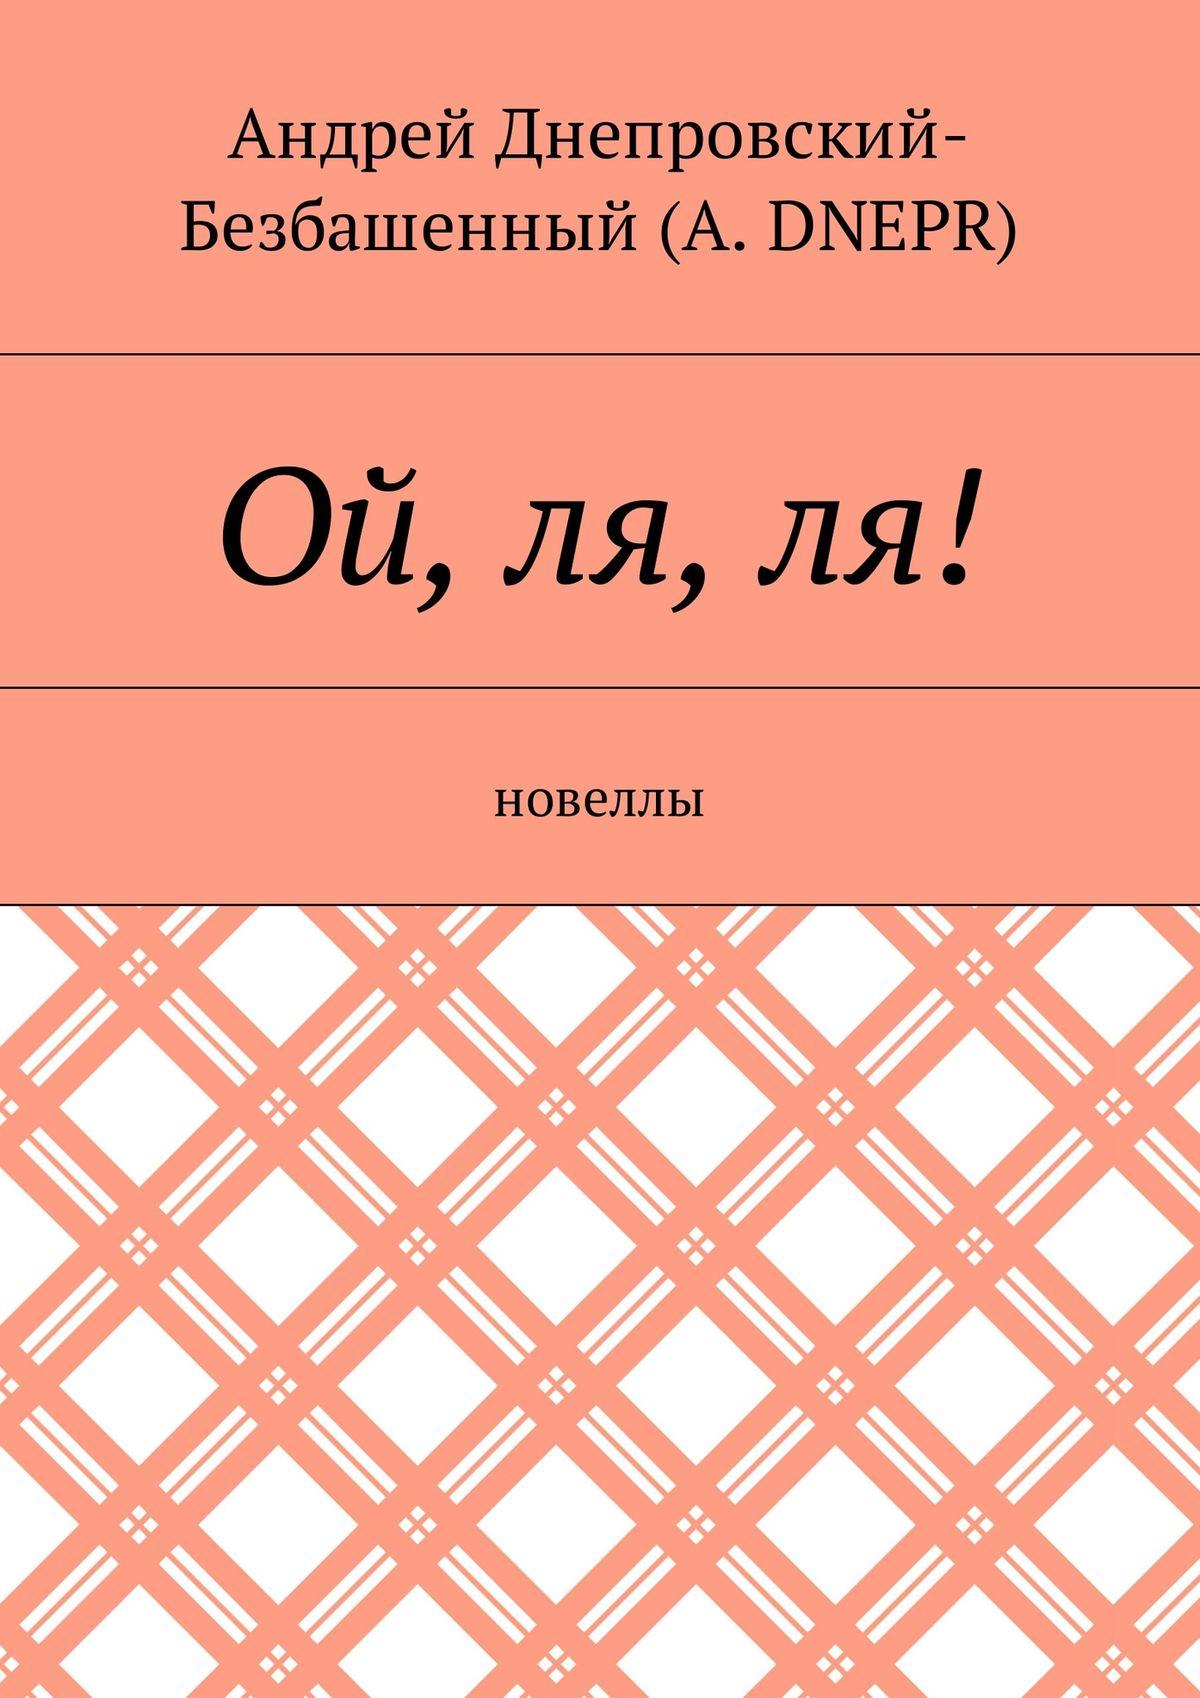 все цены на Андрей Днепровский-Безбашенный (A.DNEPR) Ой, ля,ля! Новеллы онлайн